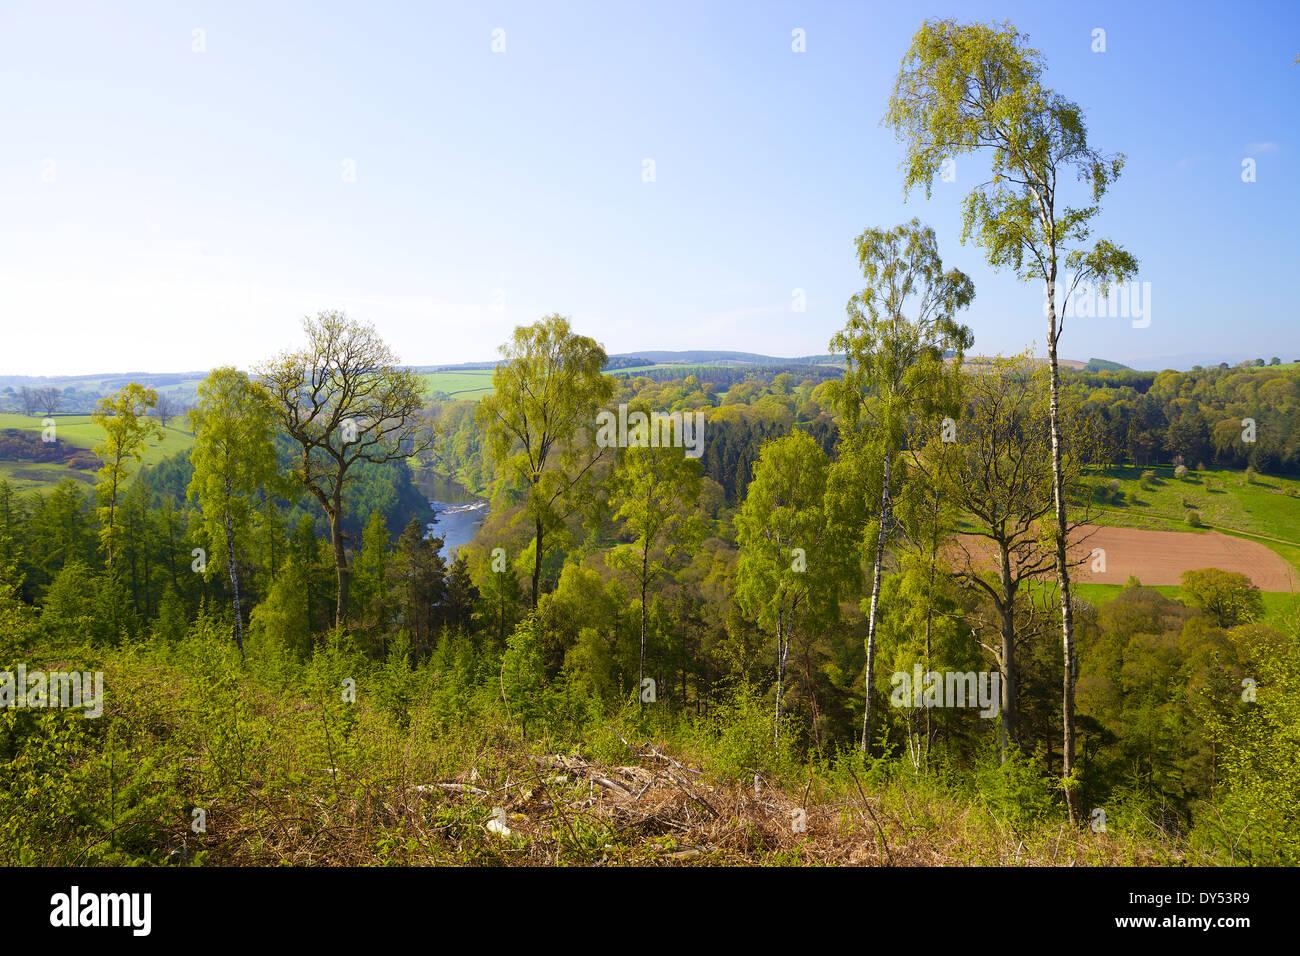 River Eden through the silver birch trees. Armathwaite, Eden Valley, Cumbria, England, United Kingdom. Summer - Stock Image